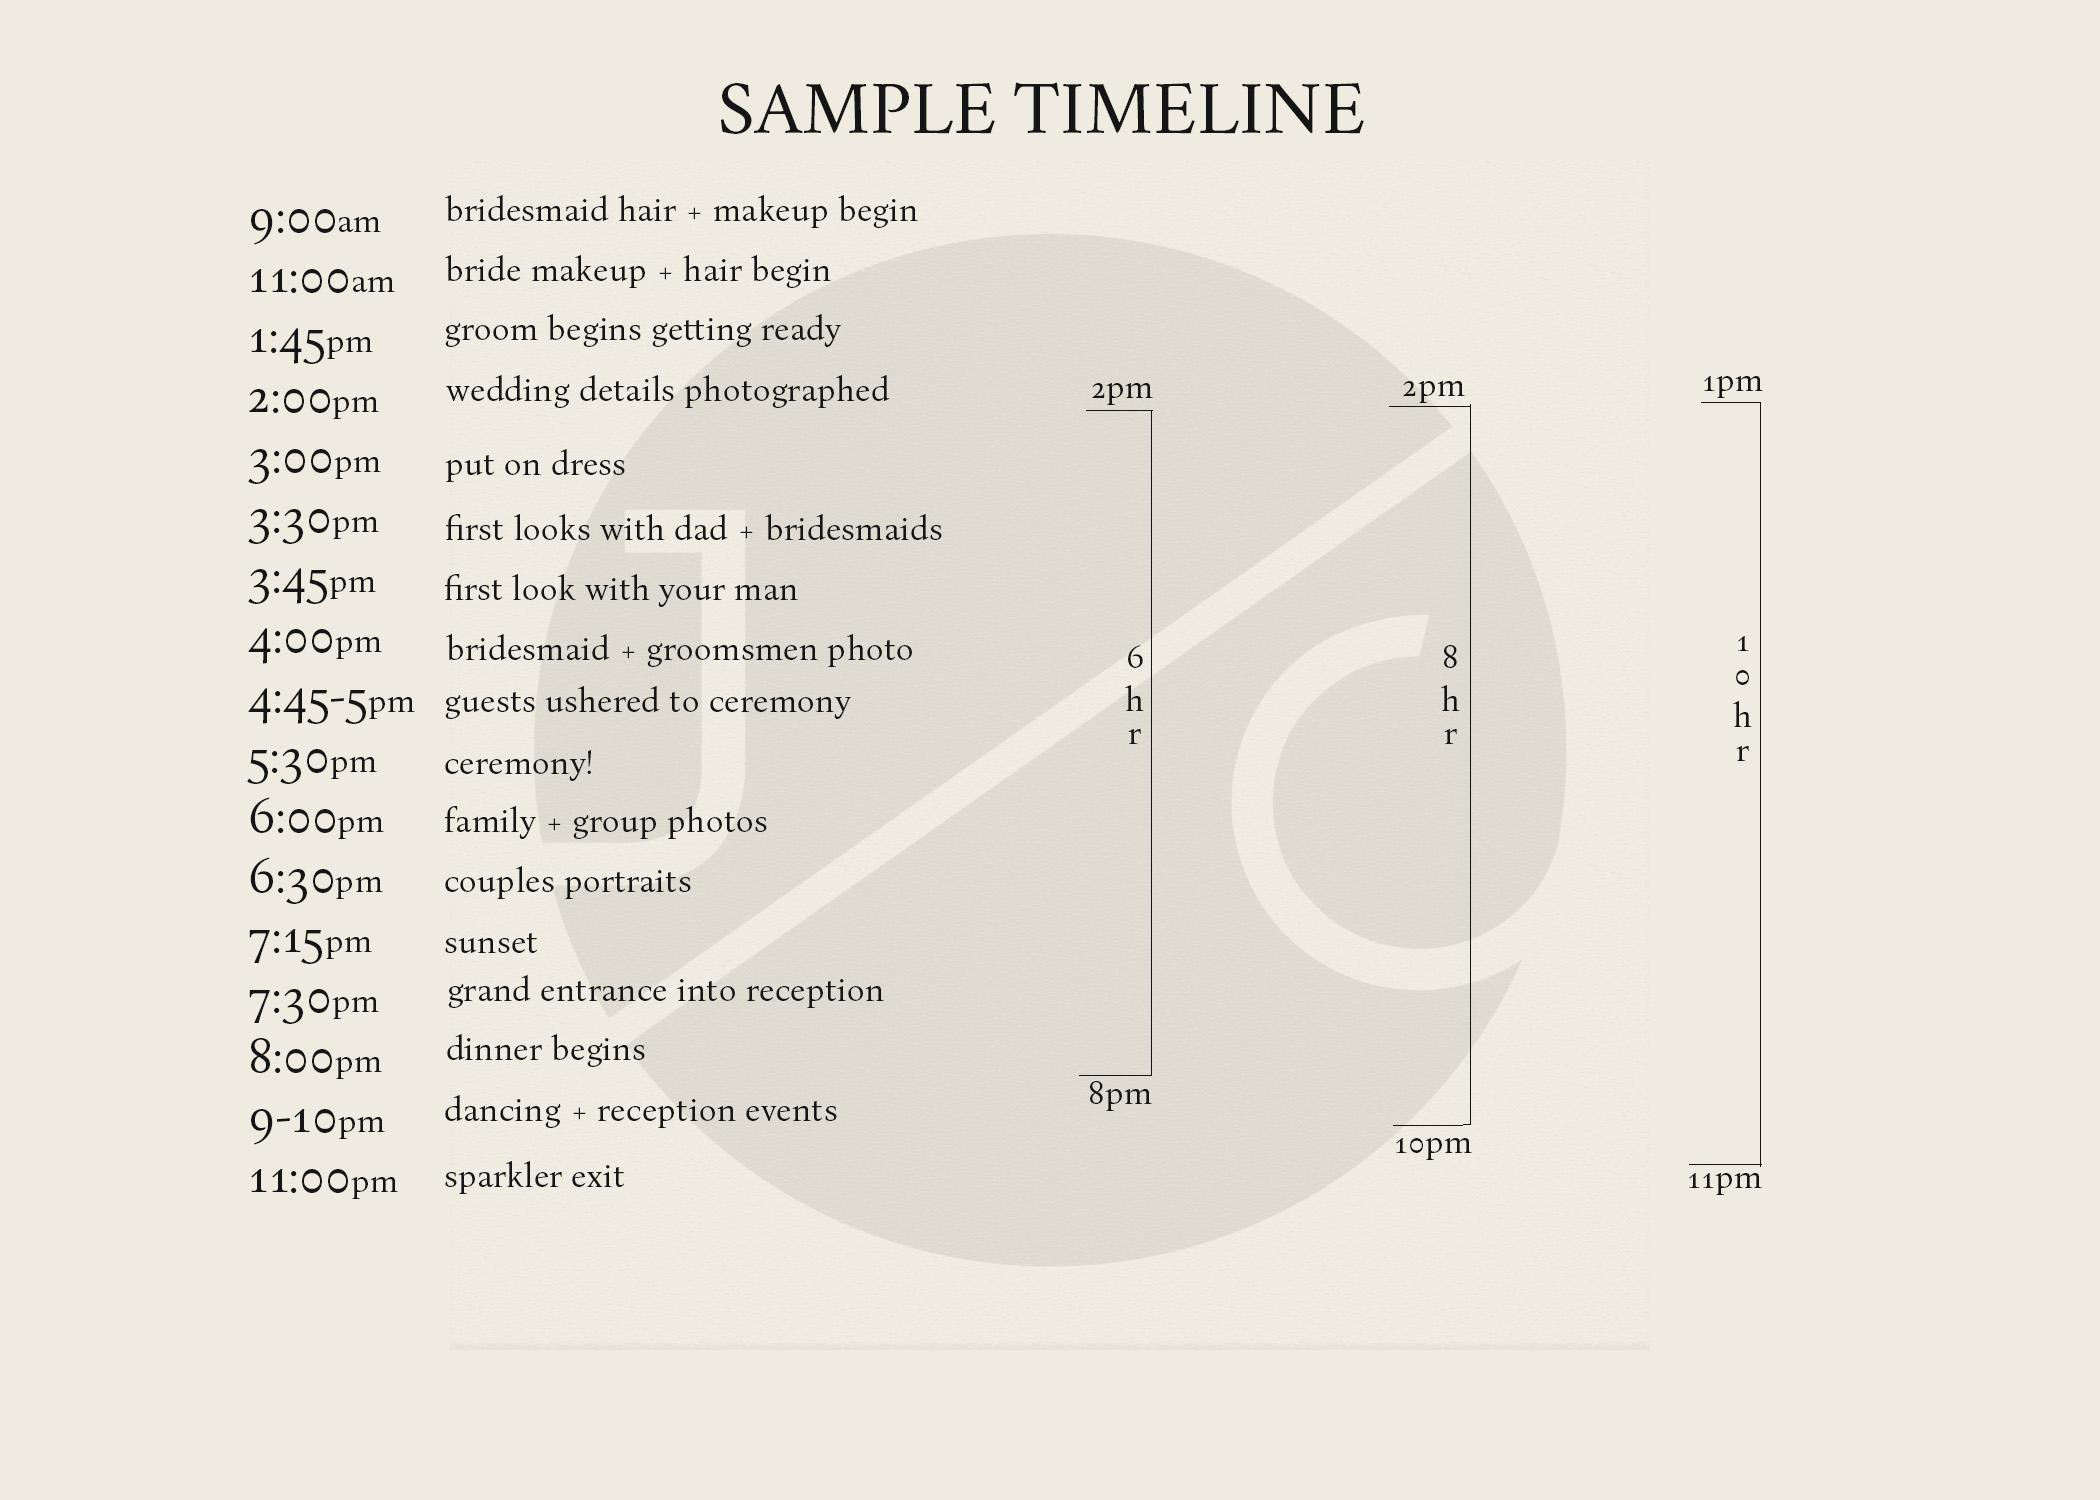 sample timeline.jpg